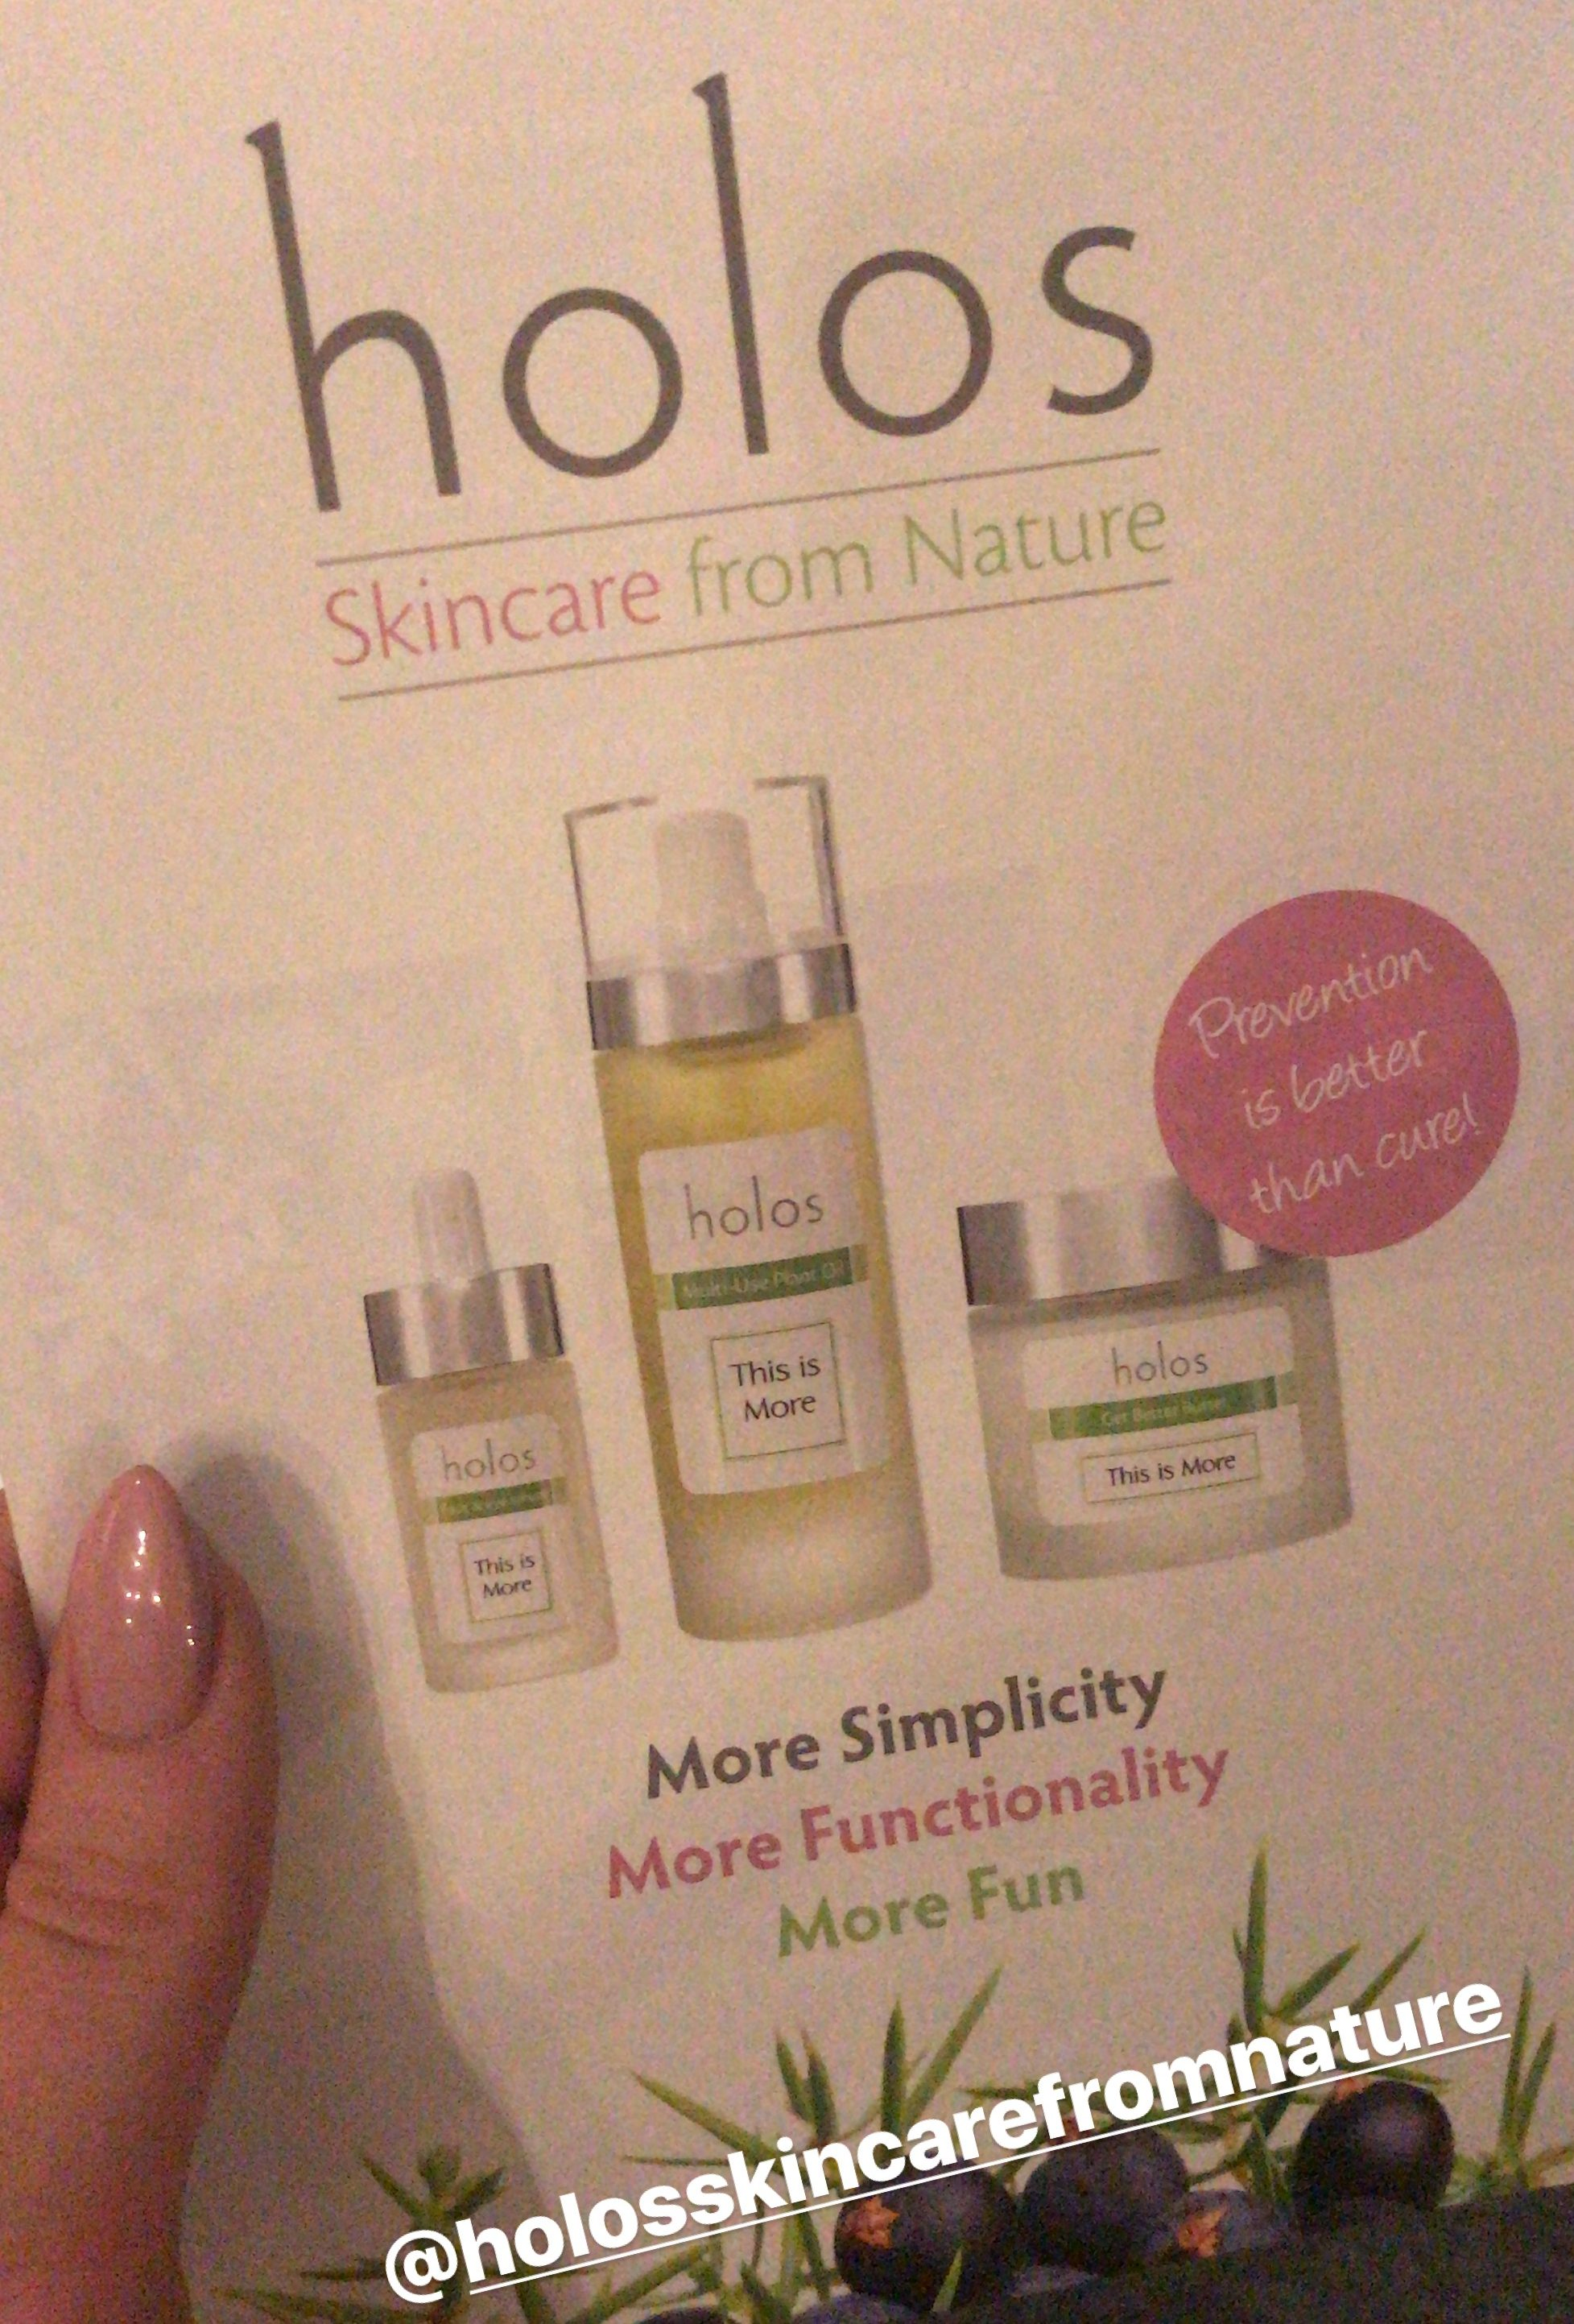 Holos Skincare Wexford